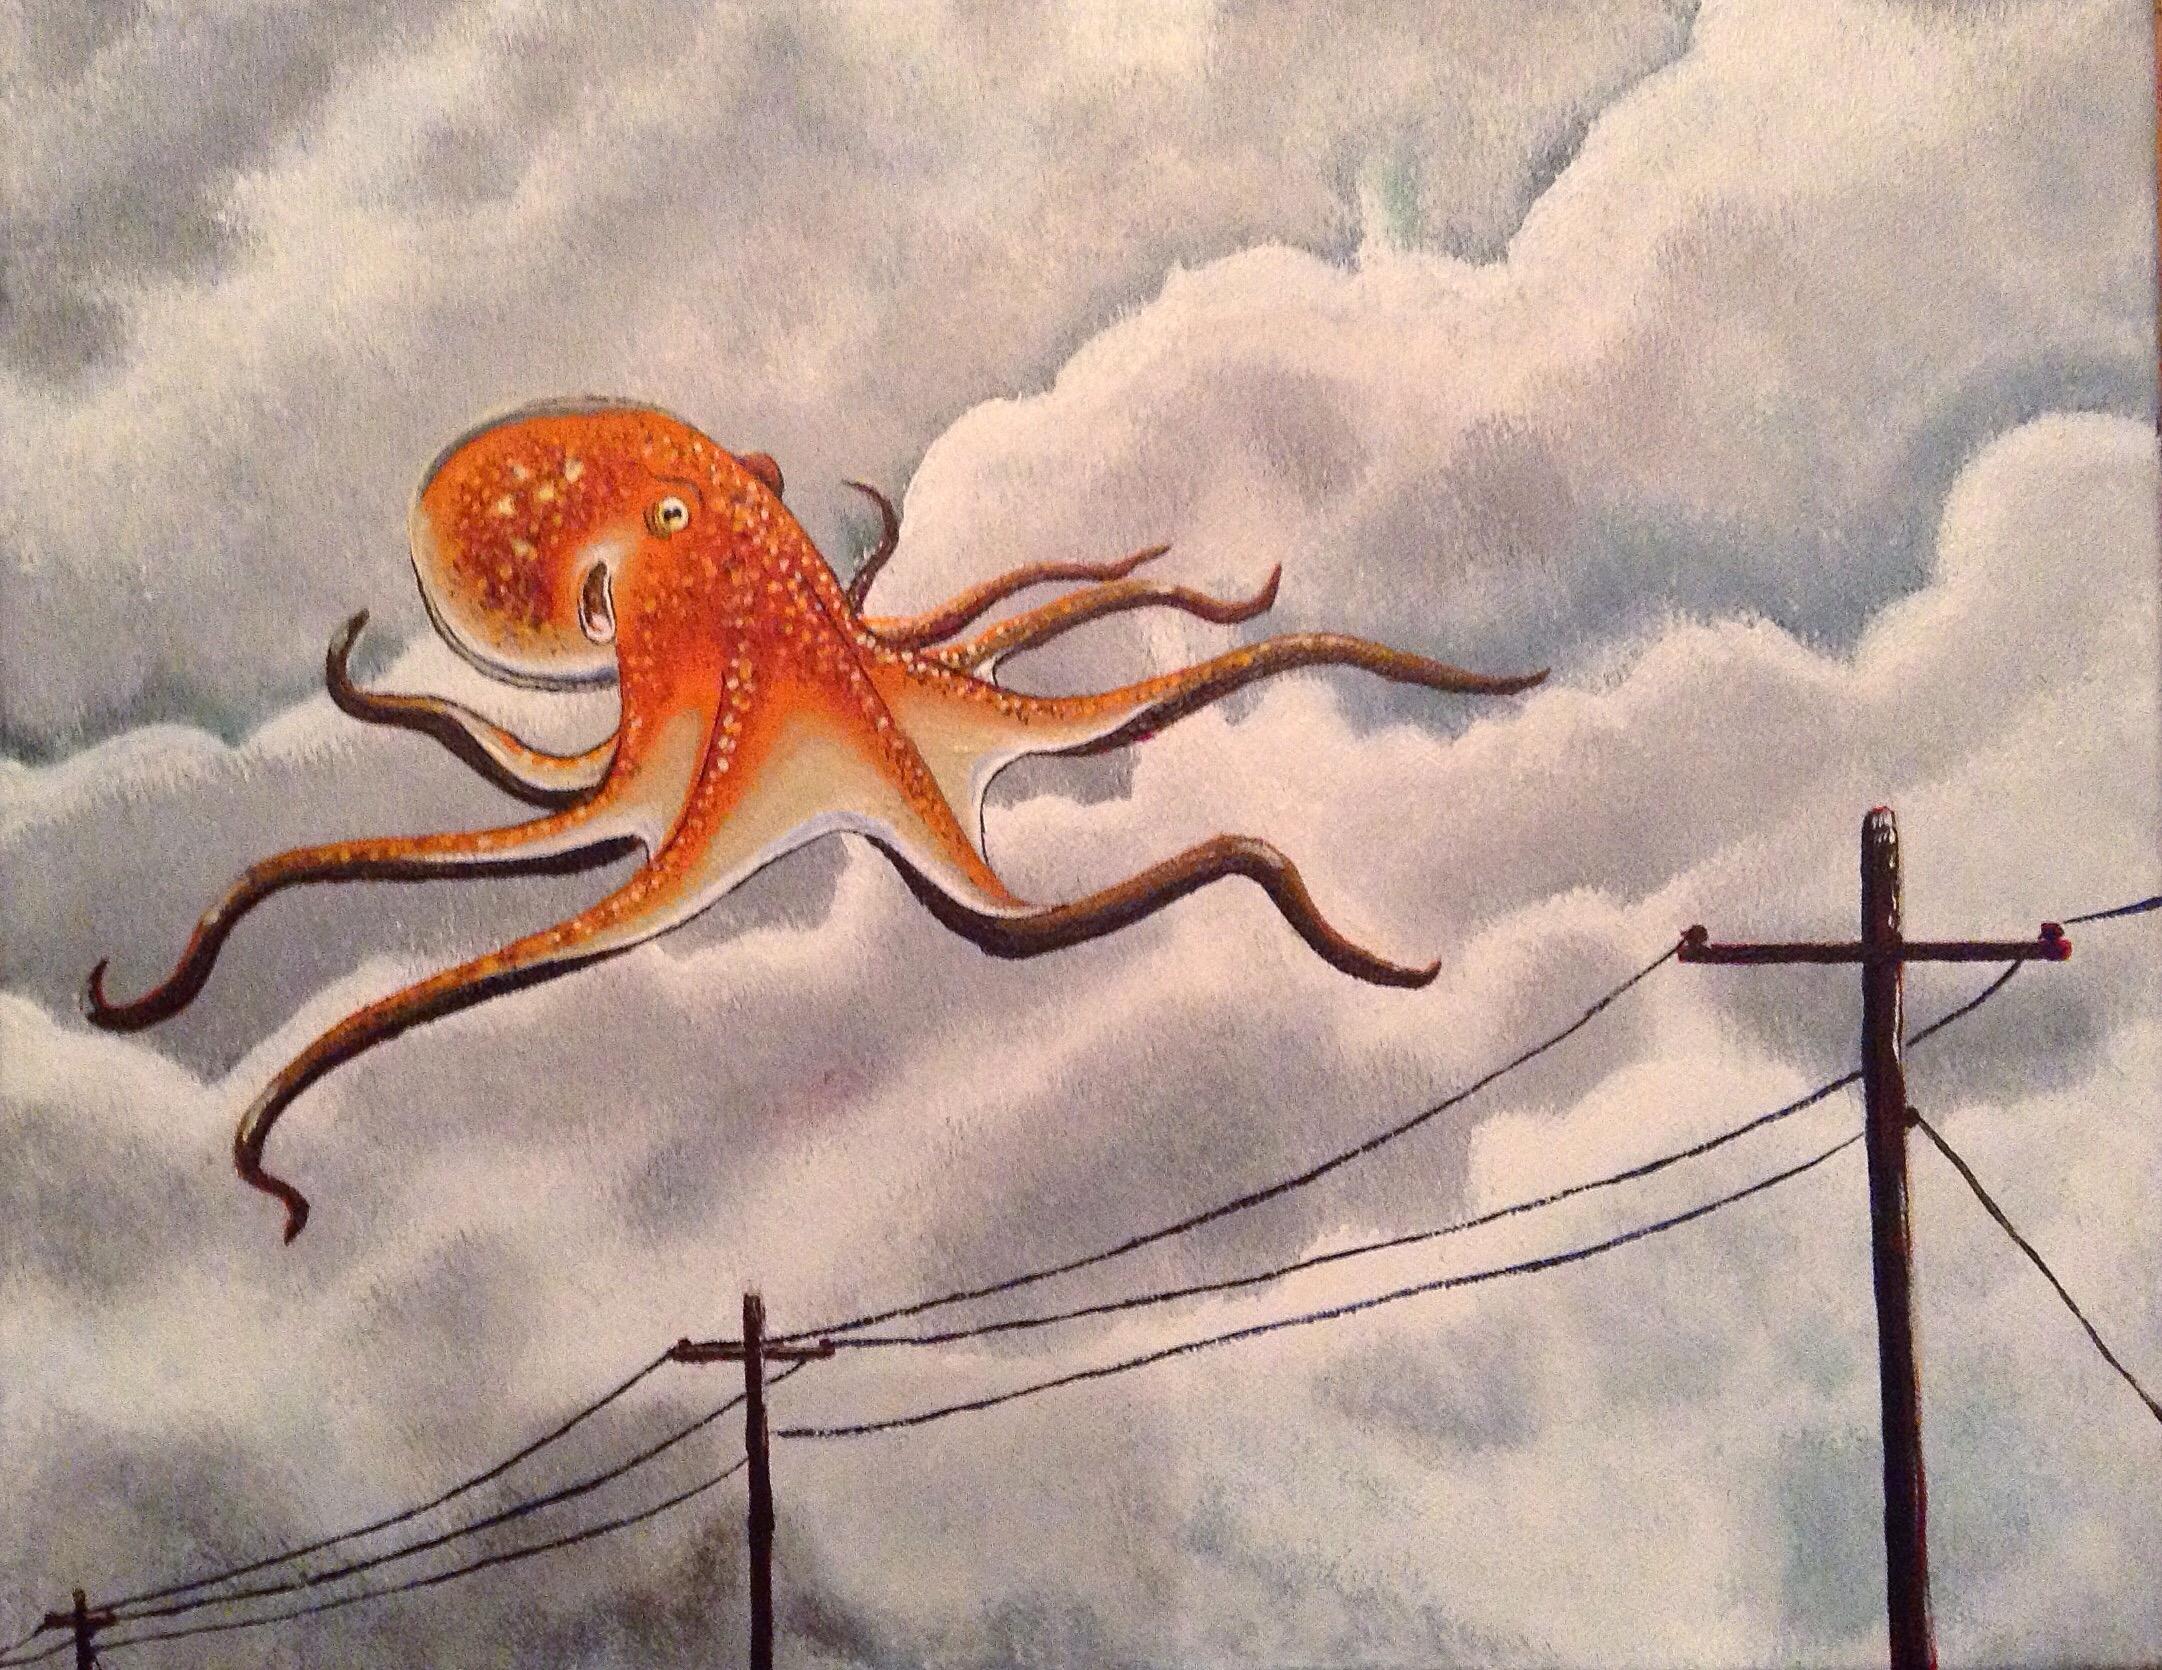 Unidentified Flying Octopus / acrylic, 11x14in / $200